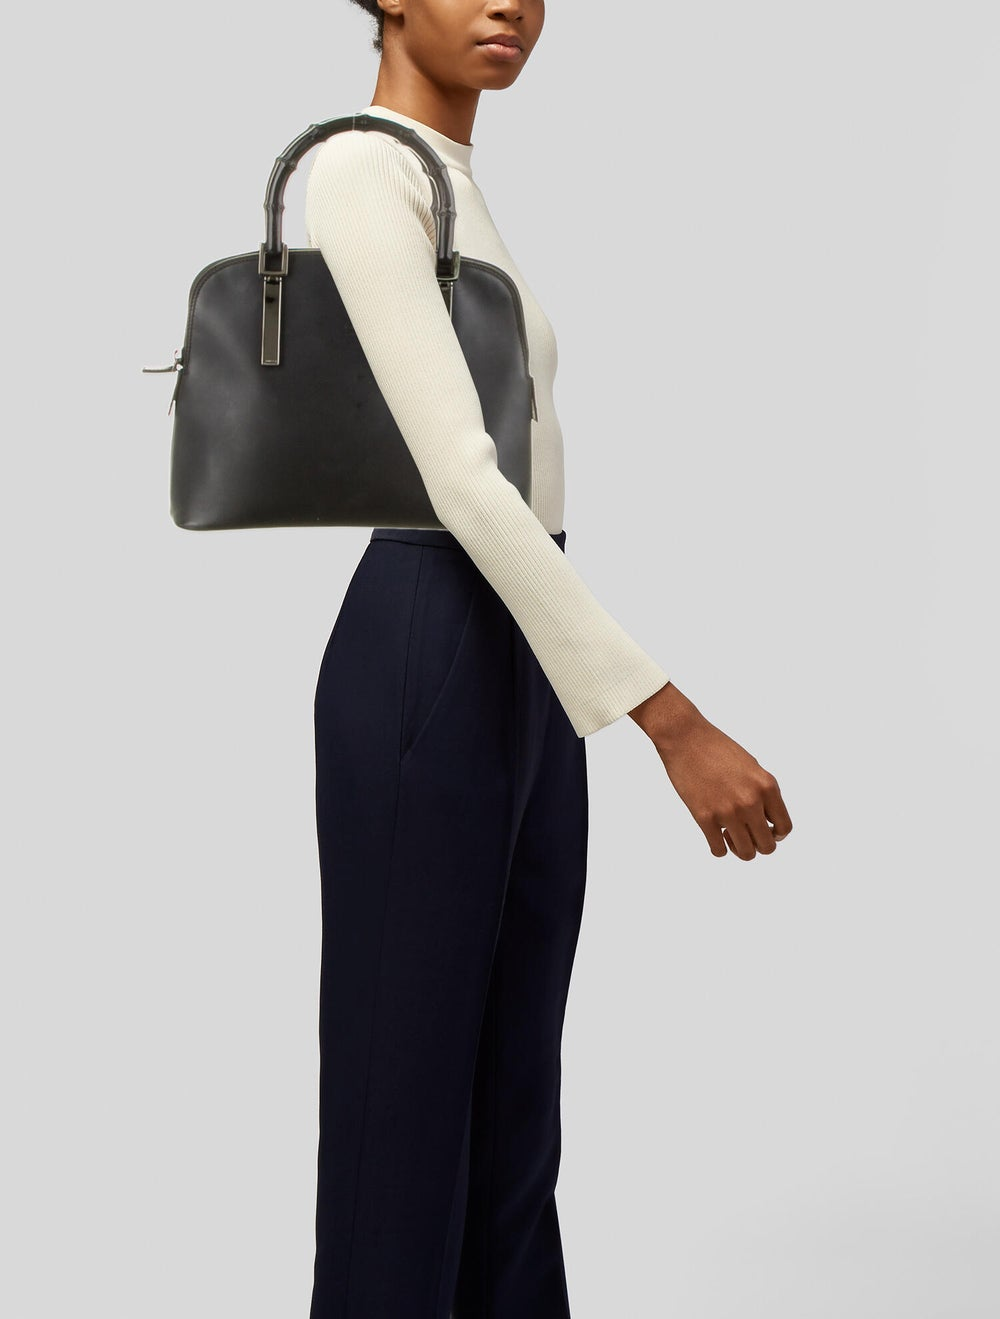 Gucci Bamboo Top Handle Bag Black - image 2